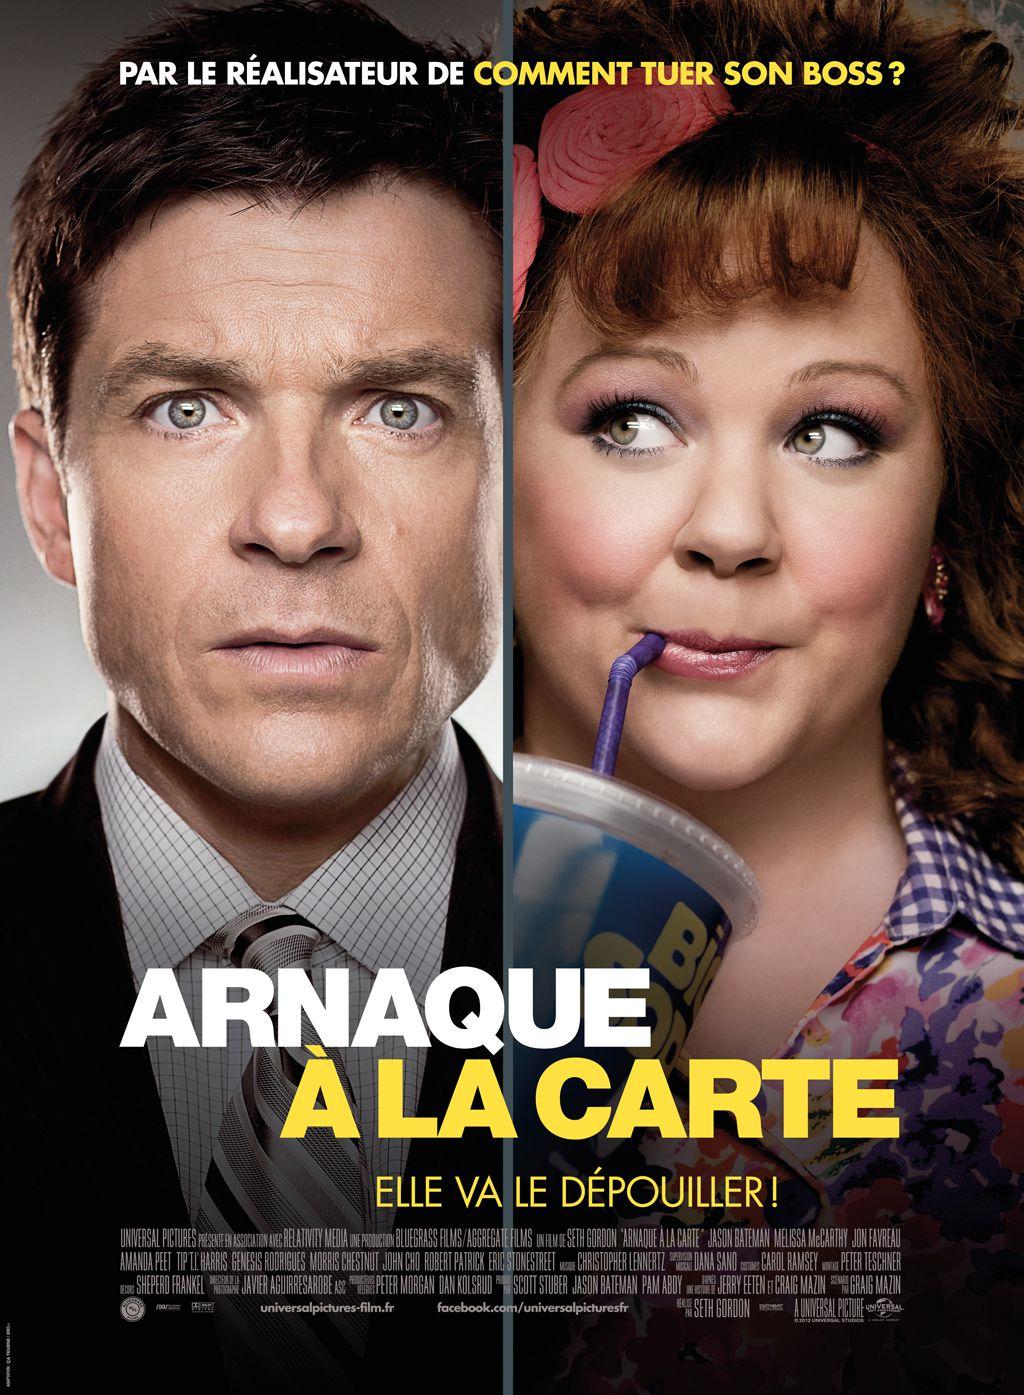 Arnaque à la carte - Film (2013)